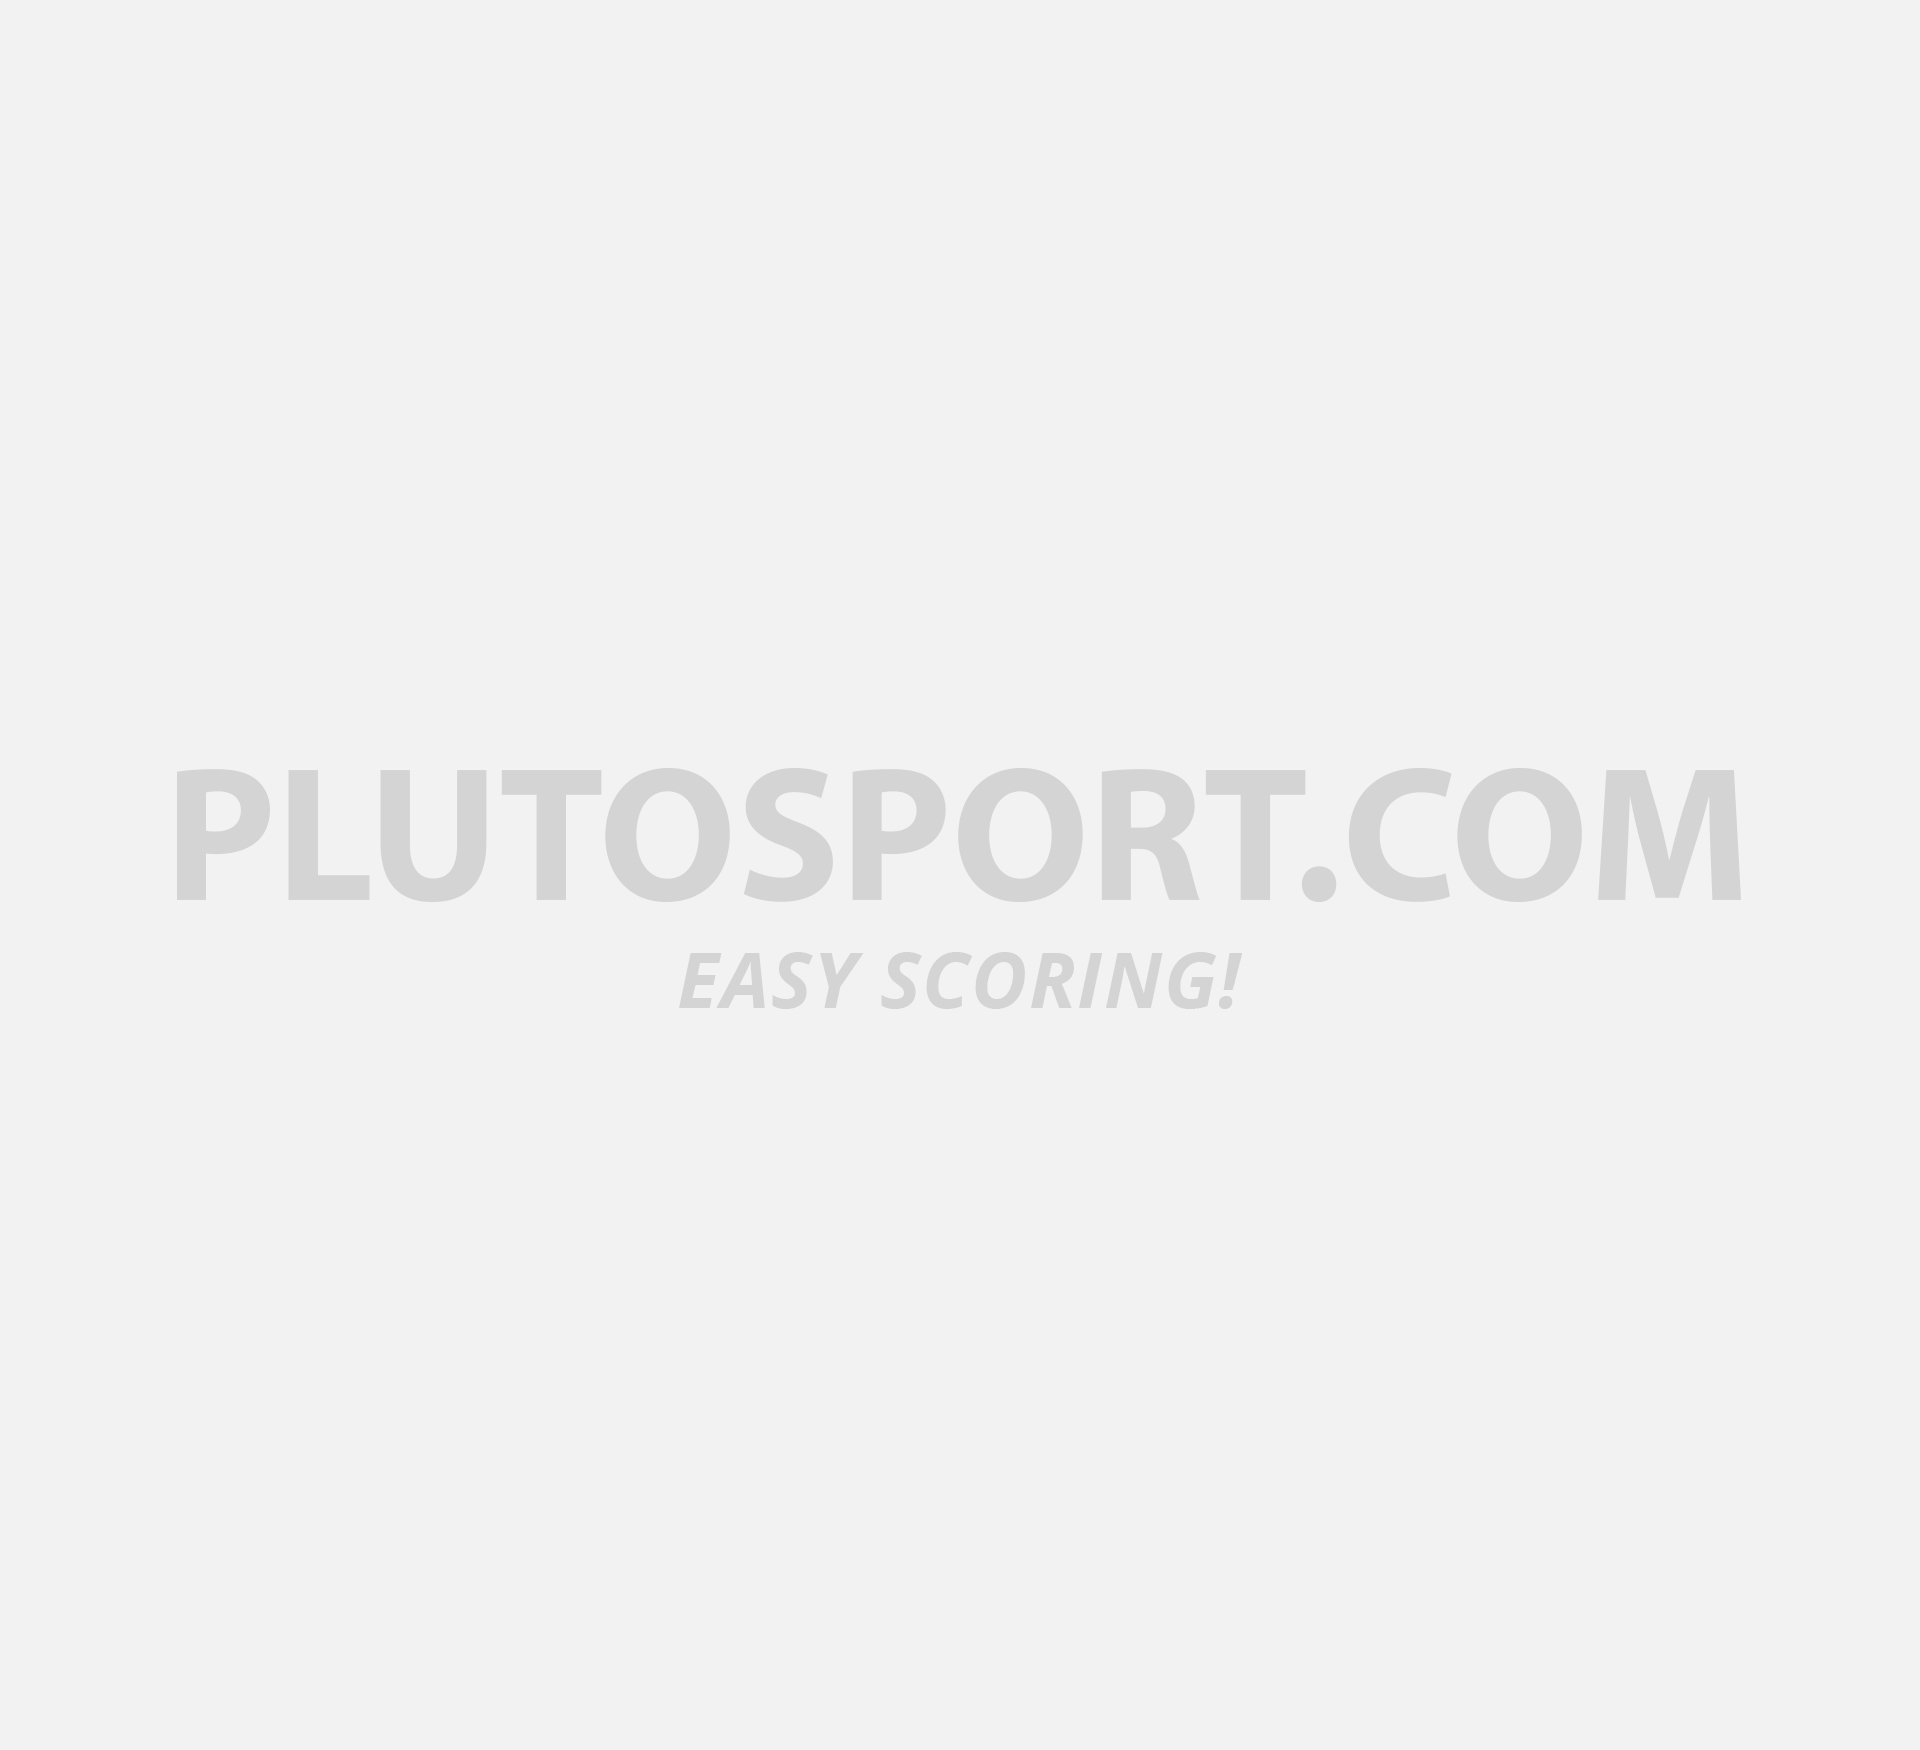 timeless design 763f2 f00f6 Adidas Bercuda 2.0 Wms Tennisshoe - Gravel - Shoes - Tennis - Sports    Plutosport